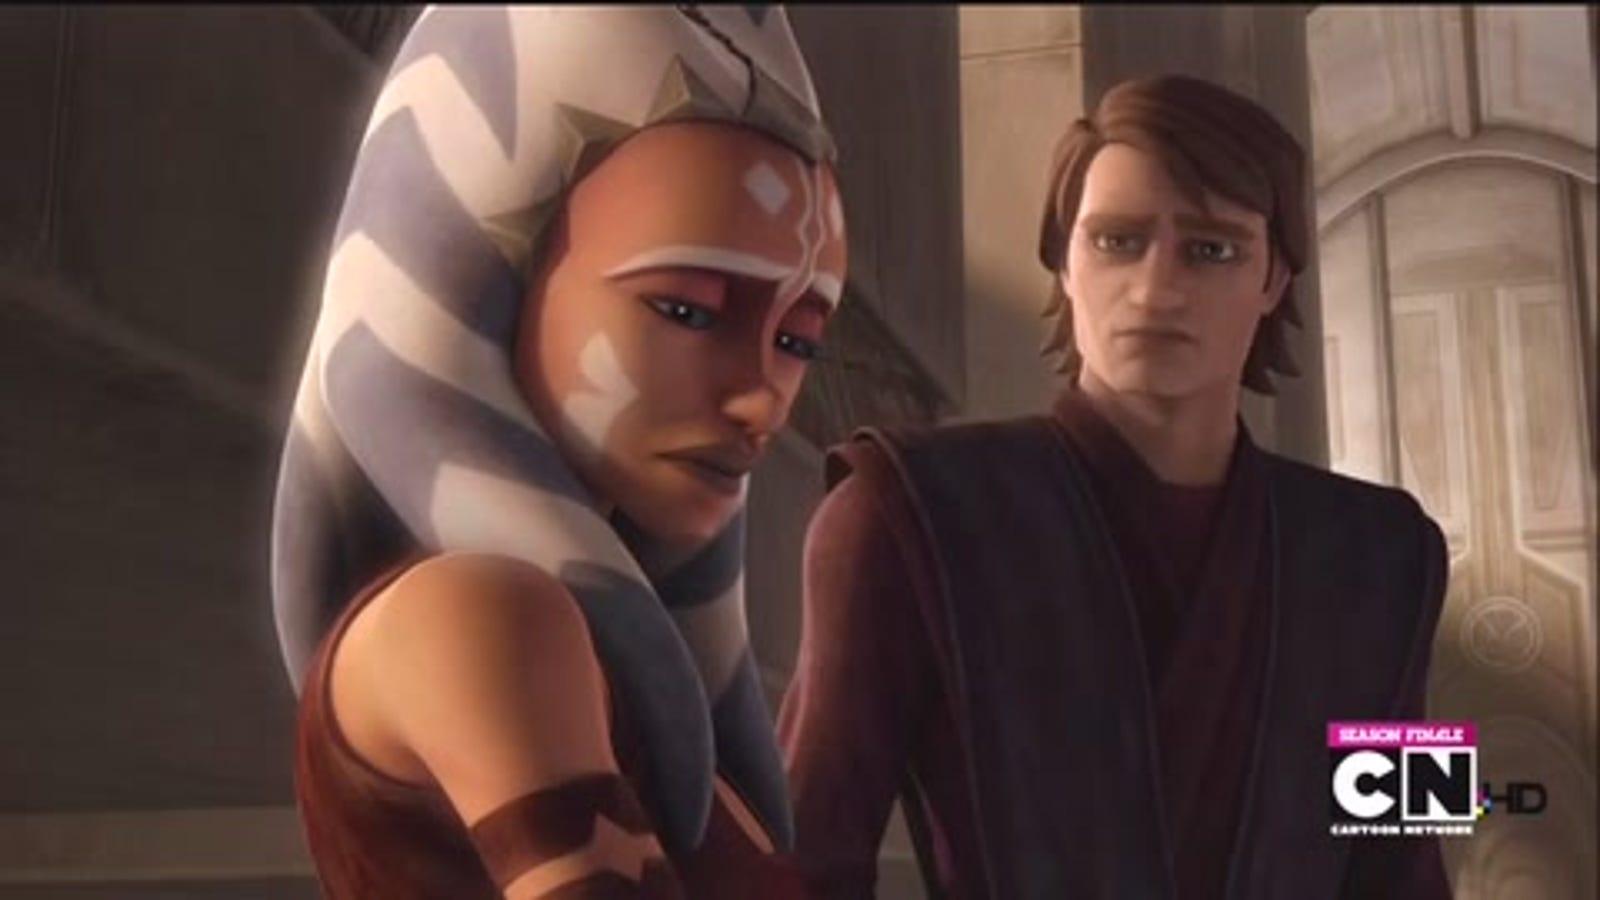 On the Clone Wars season finale, Ahsoka breaks Anakin's